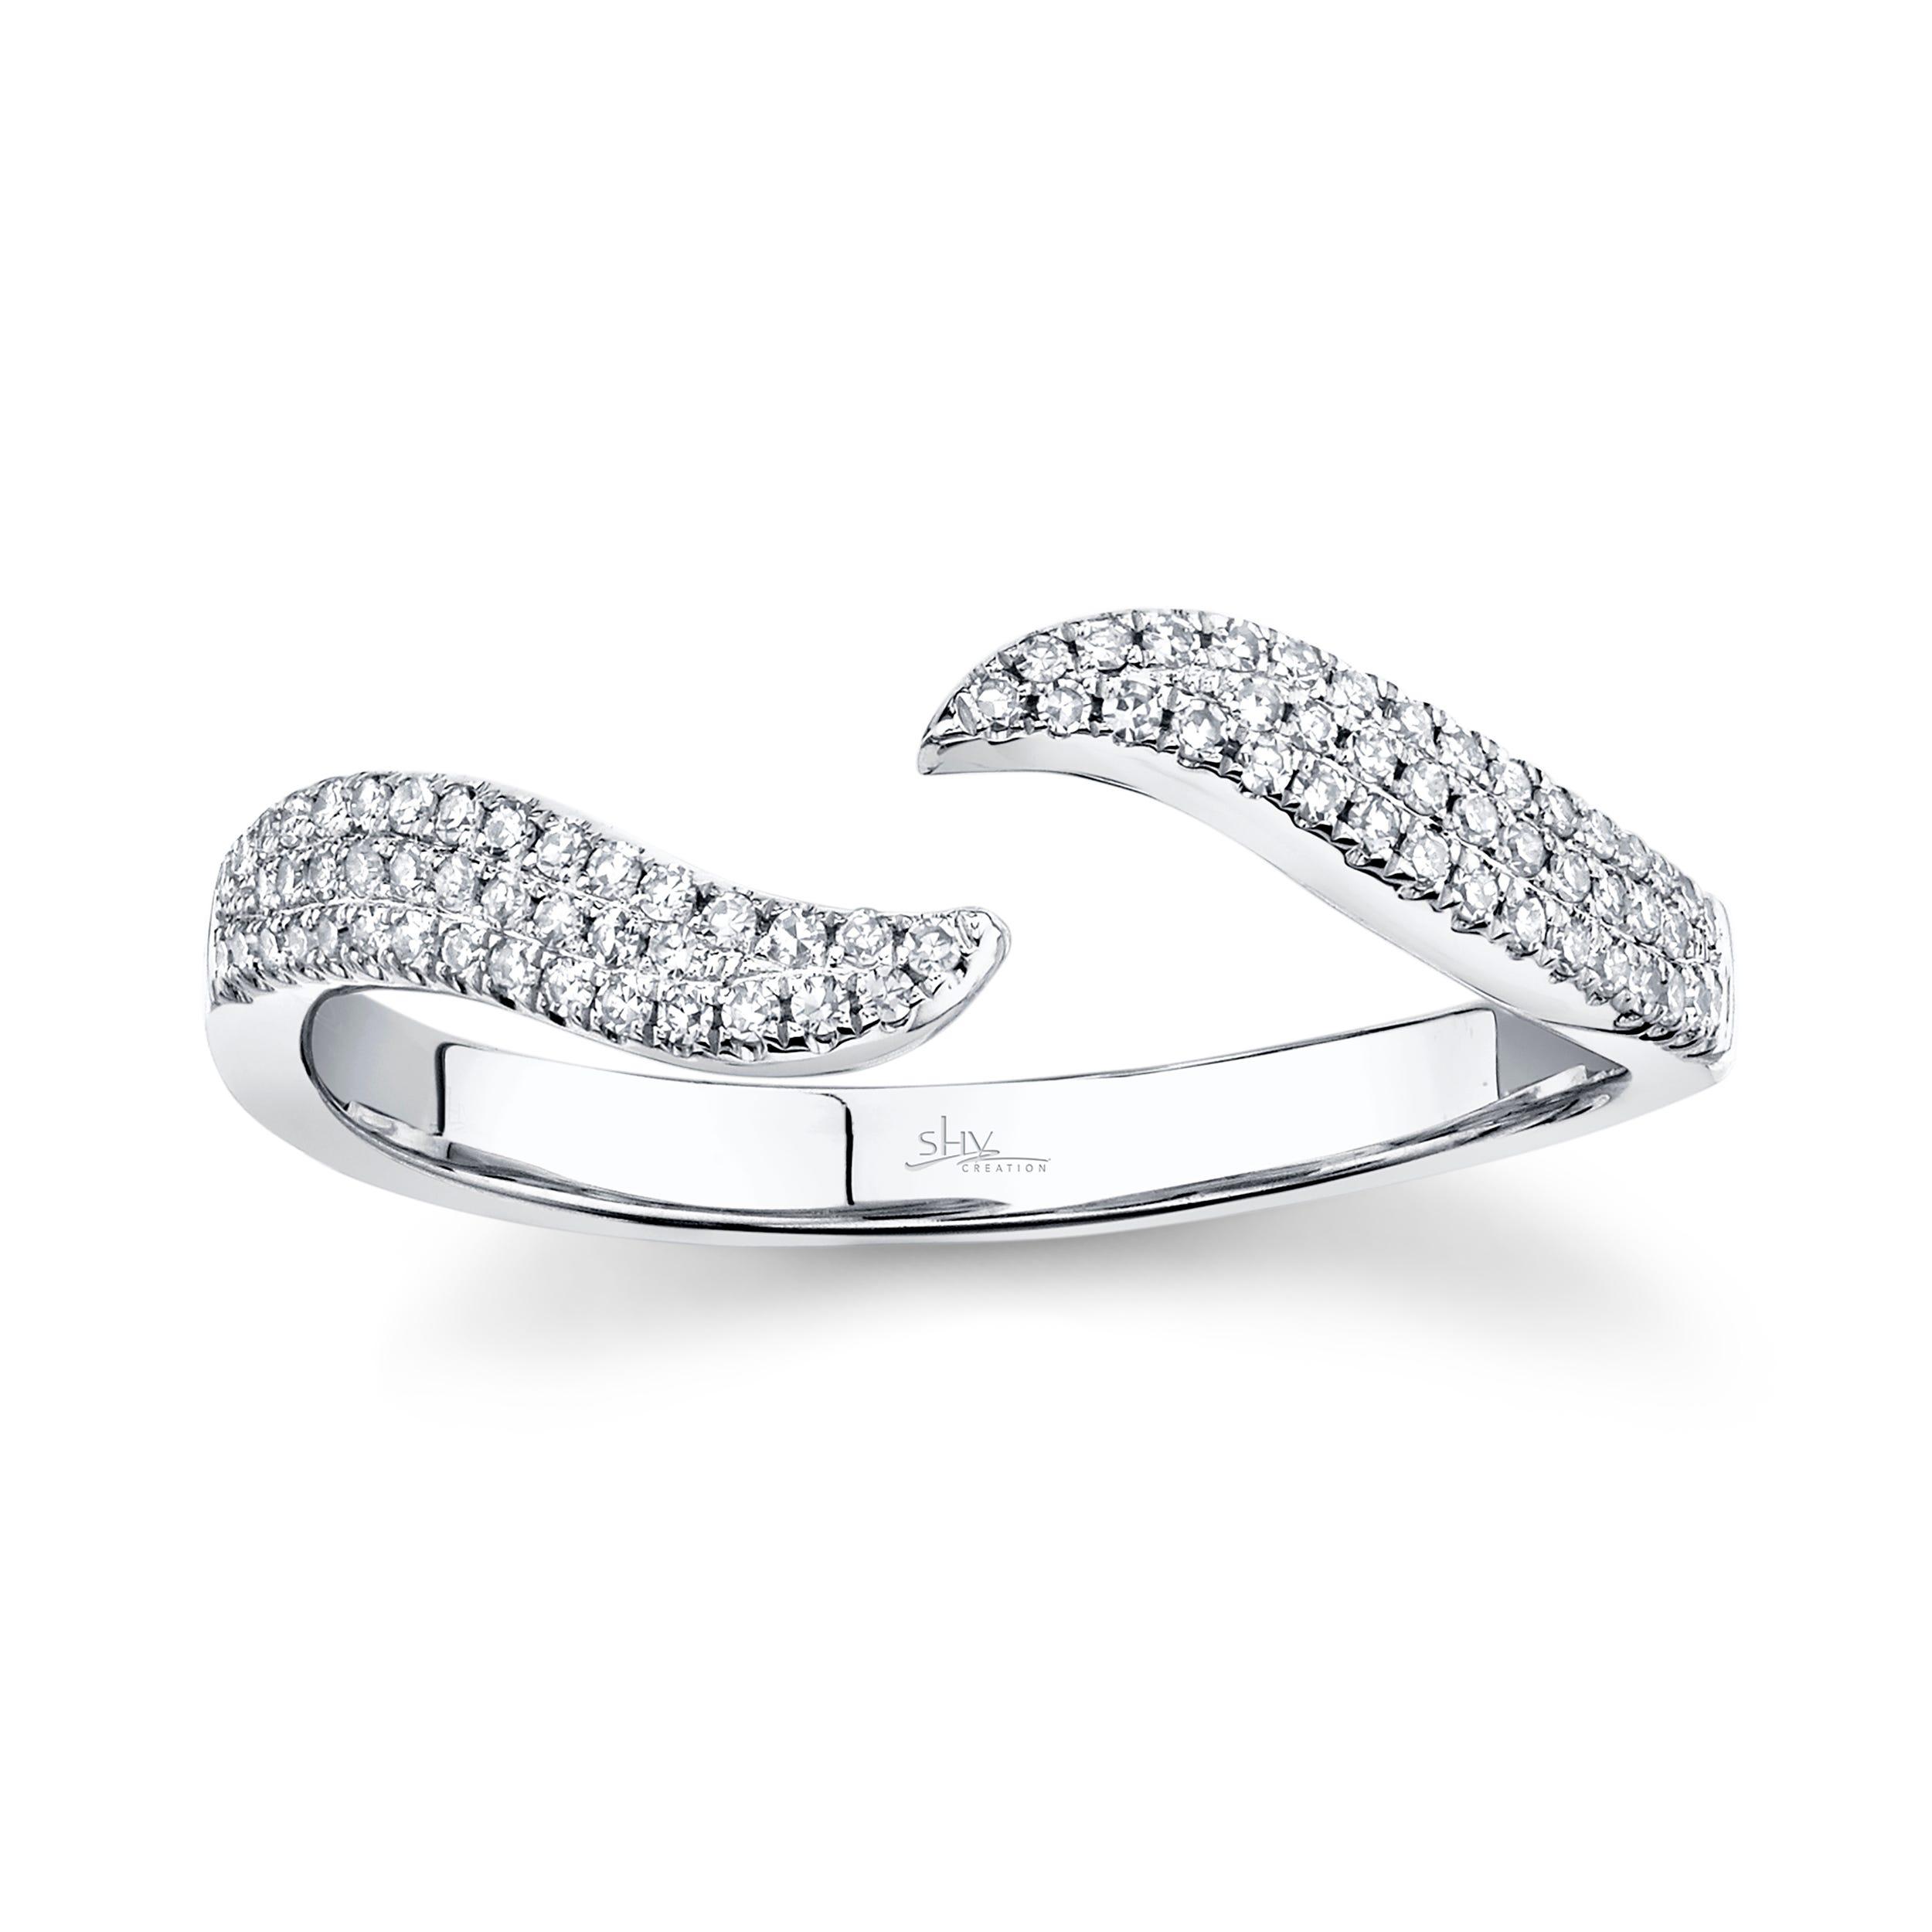 Shy Creation Diamond Open Wave Wrap Ring 14k White Gold SC55003448